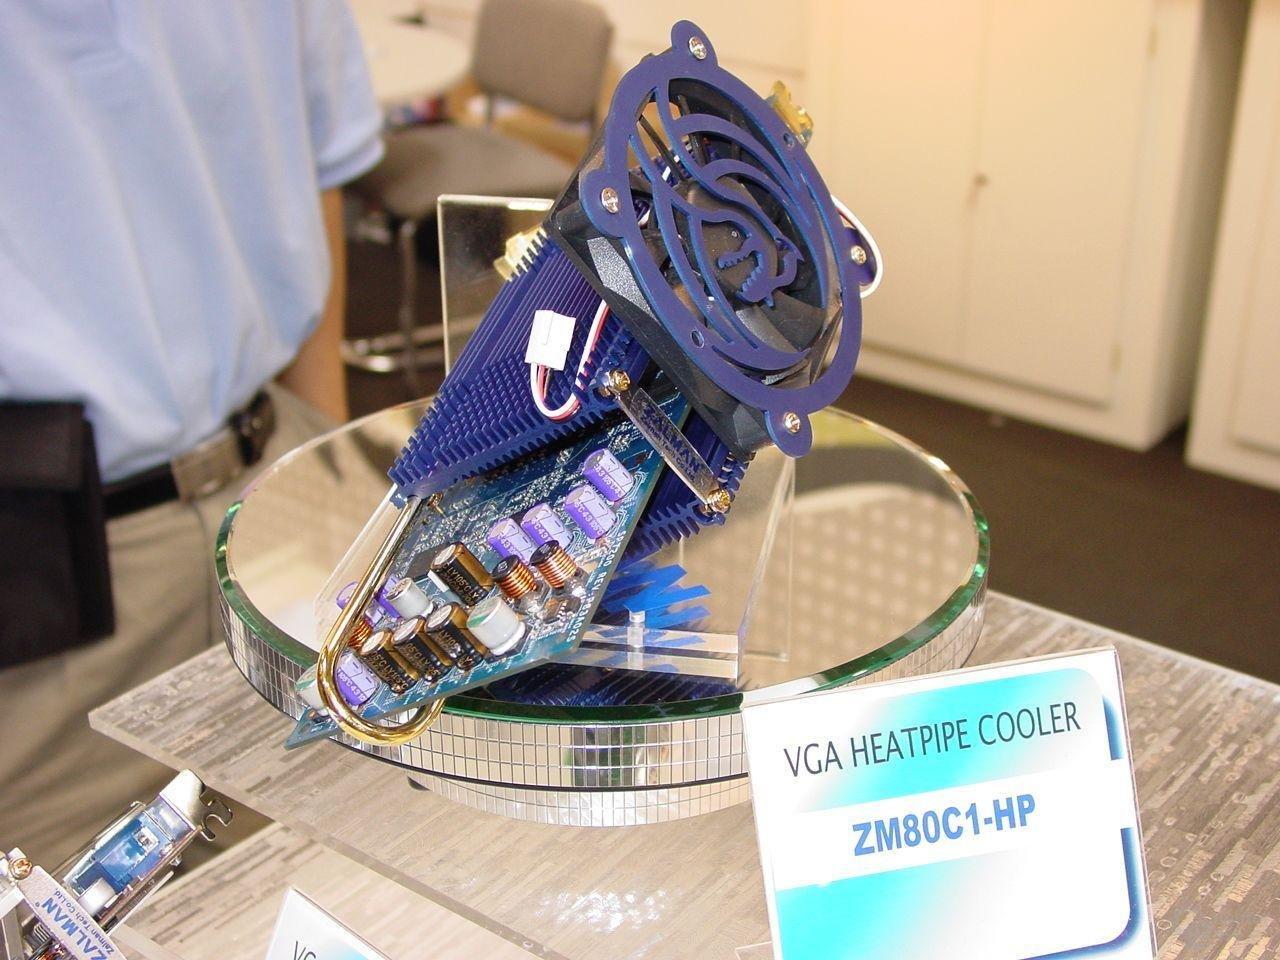 Zalman ZM80C1-HP